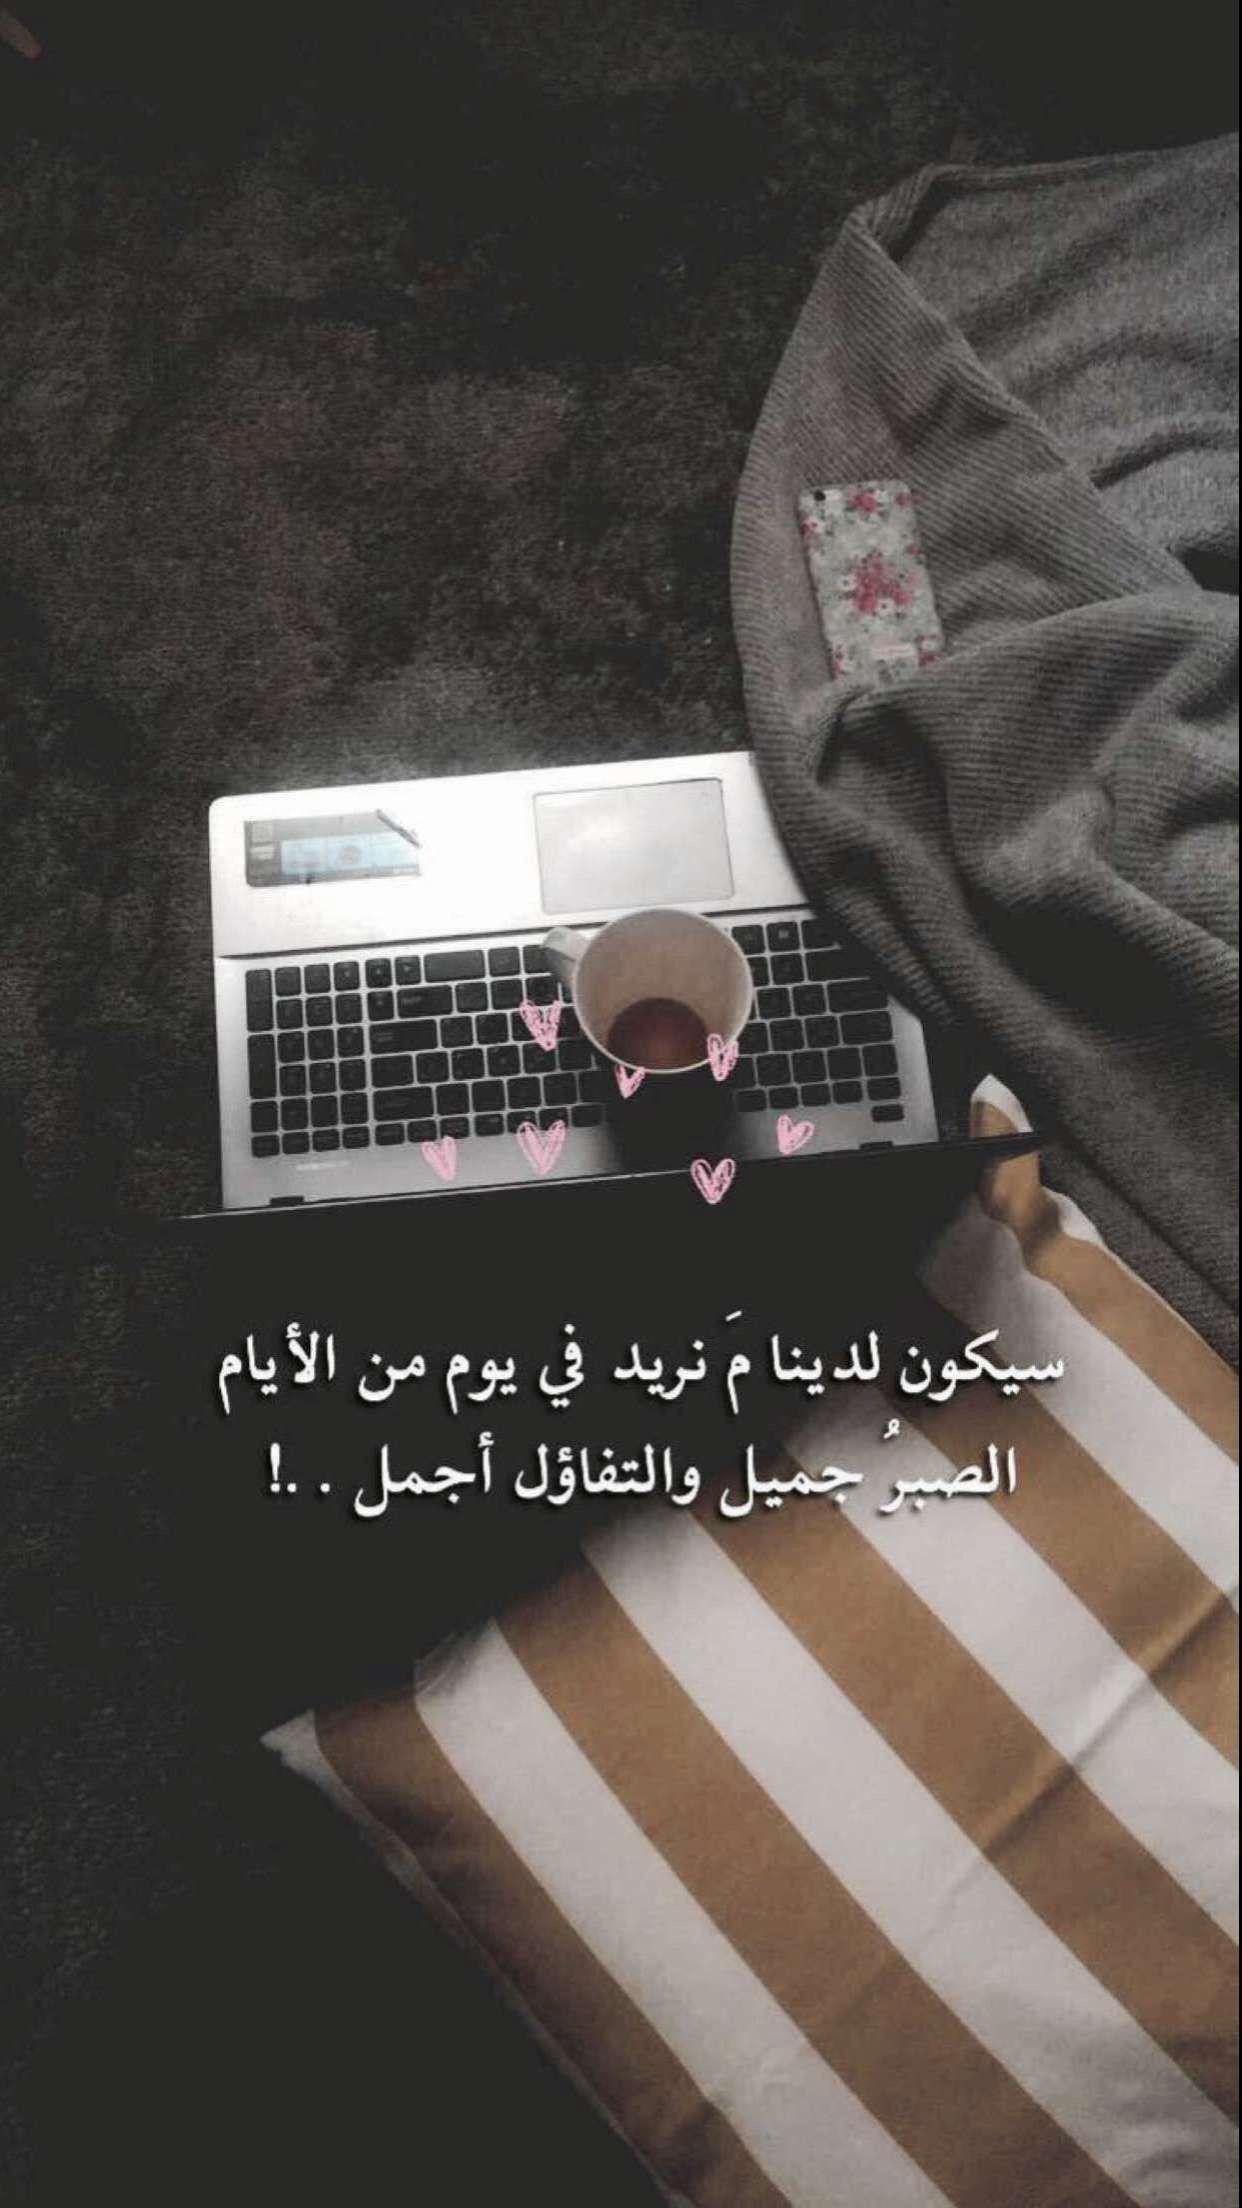 الحمدلله حمدا تستدام به النعم Arabic Quotes Arabic Love Quotes Cool Words